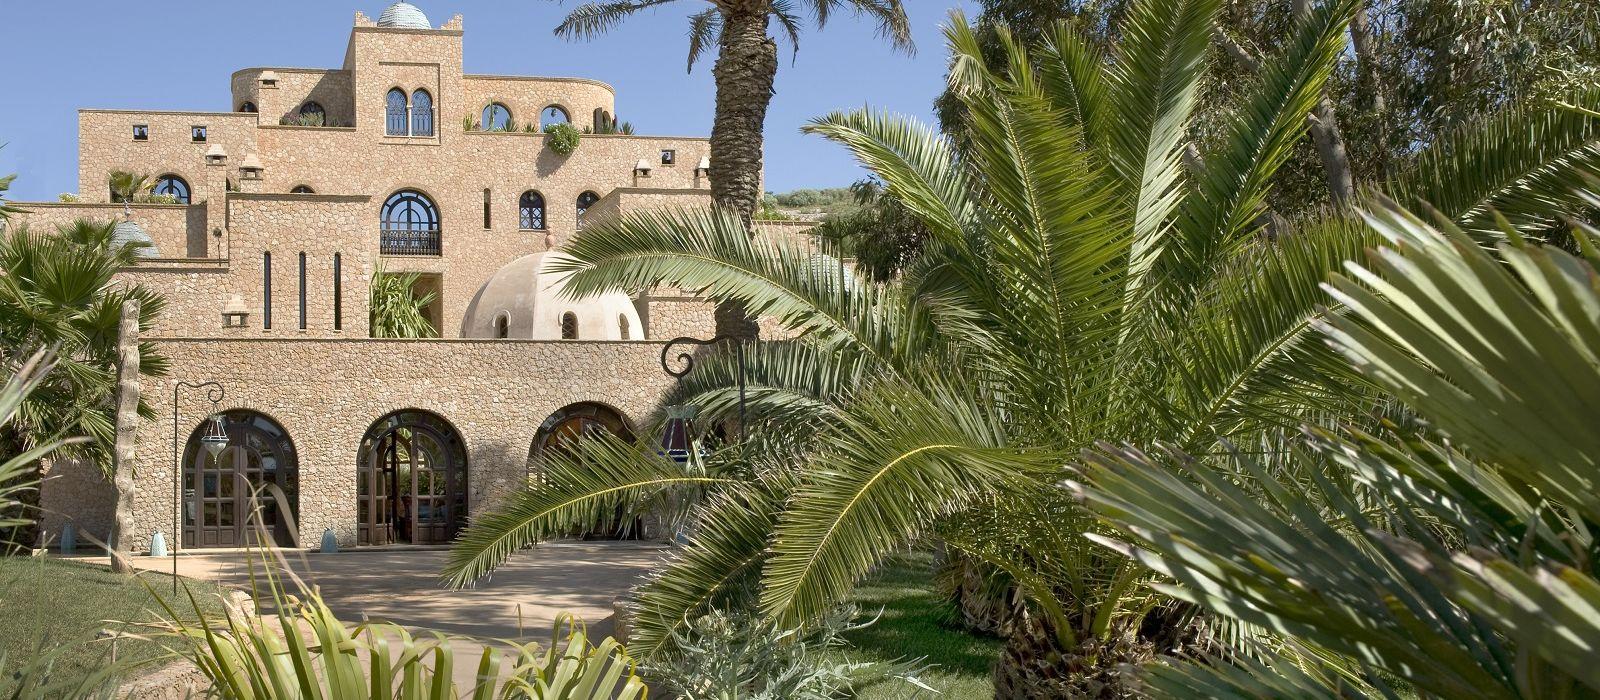 Hotel La Sultana Oualidia Marokko